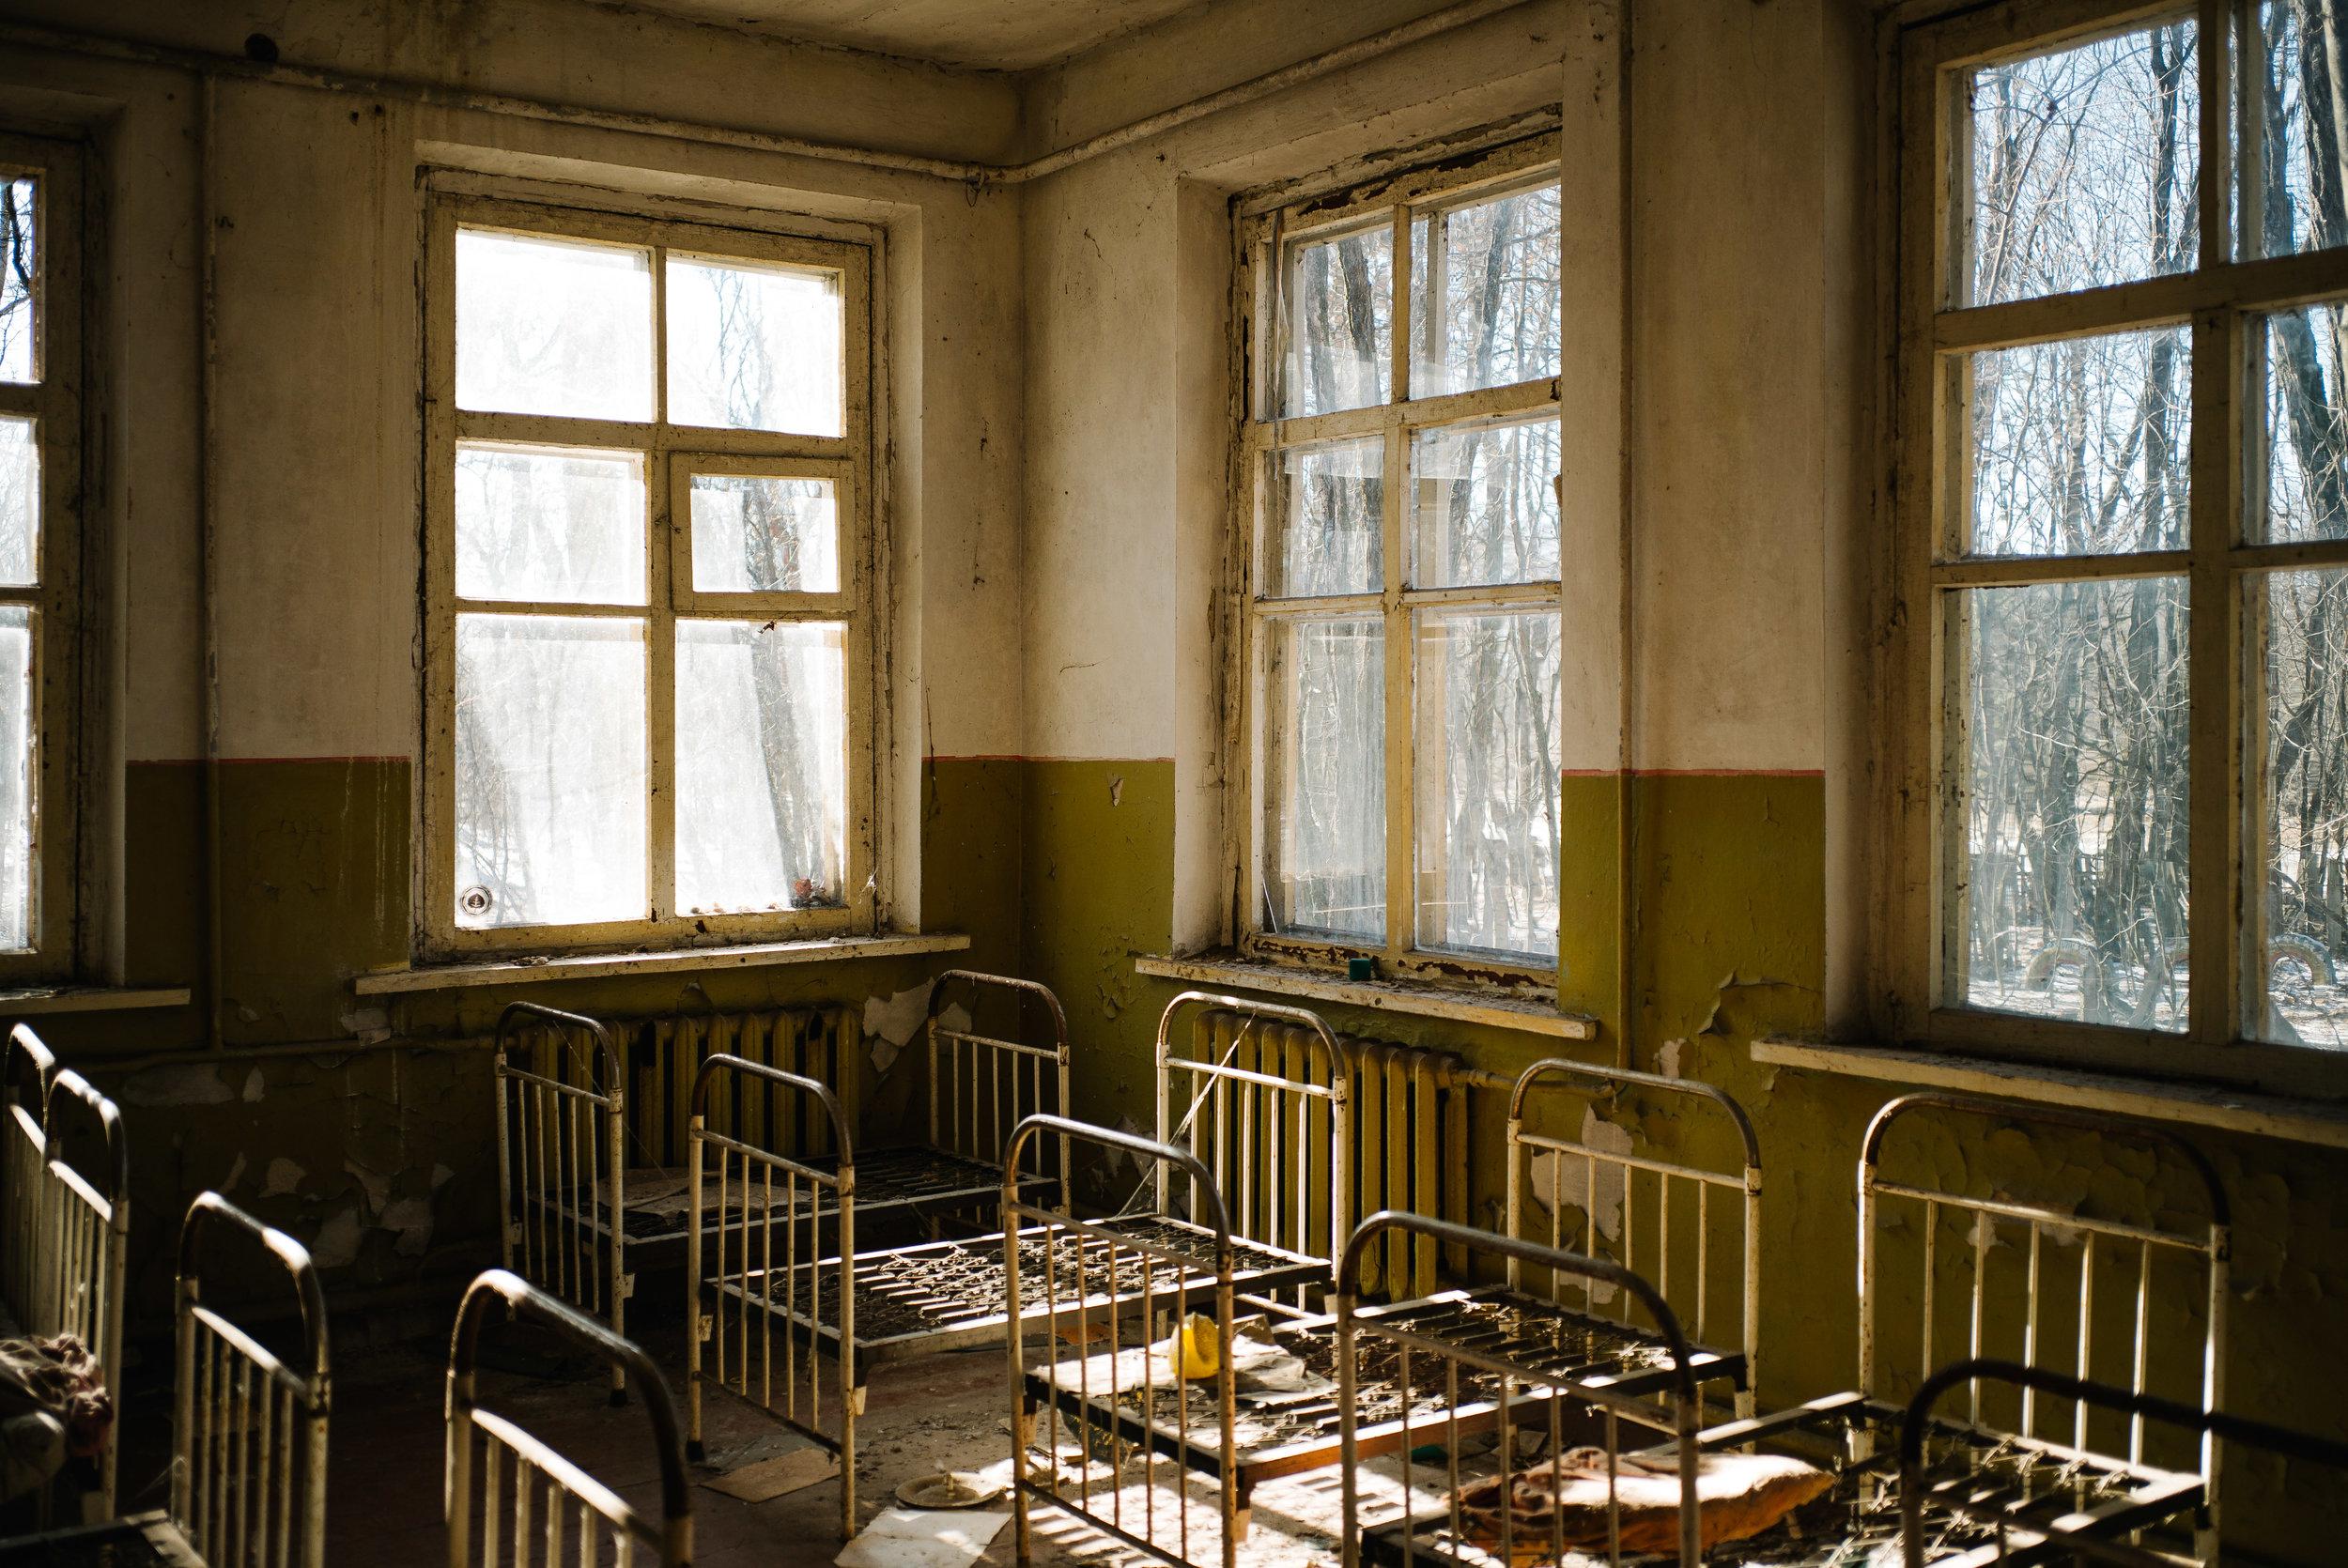 Kopachi Kindergarten School - Clifford Darby 2019